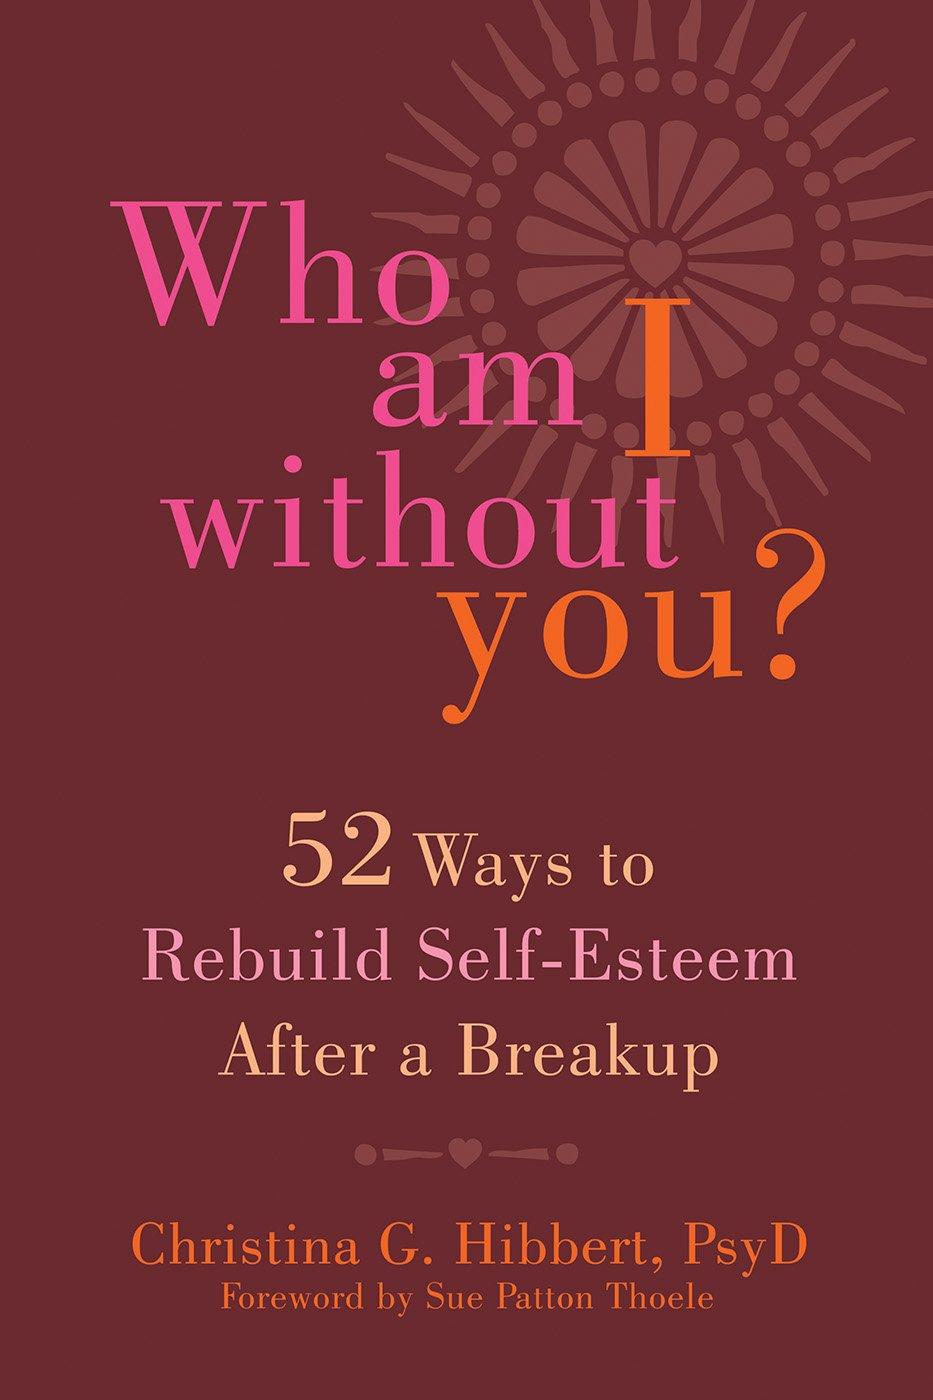 how to get self esteem after a break up